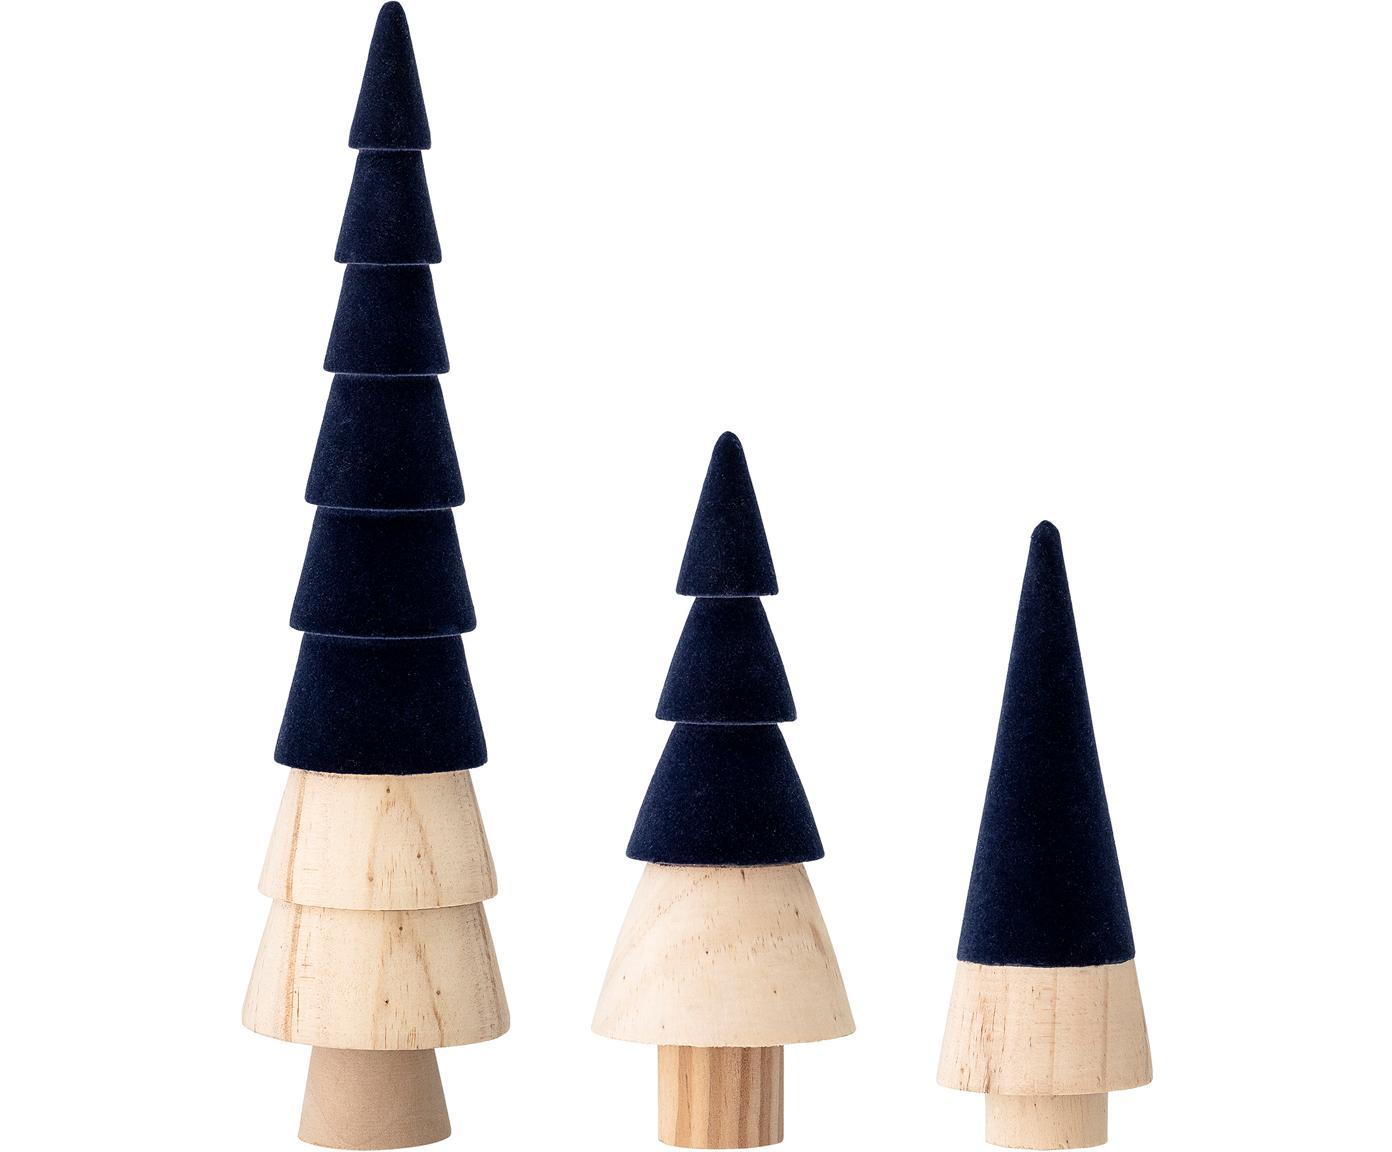 Samt-Deko-Objekte-Set Thace, 3-tlg., Holz, Polyestersamt, Dunkelblau, Holz, Sondergrößen